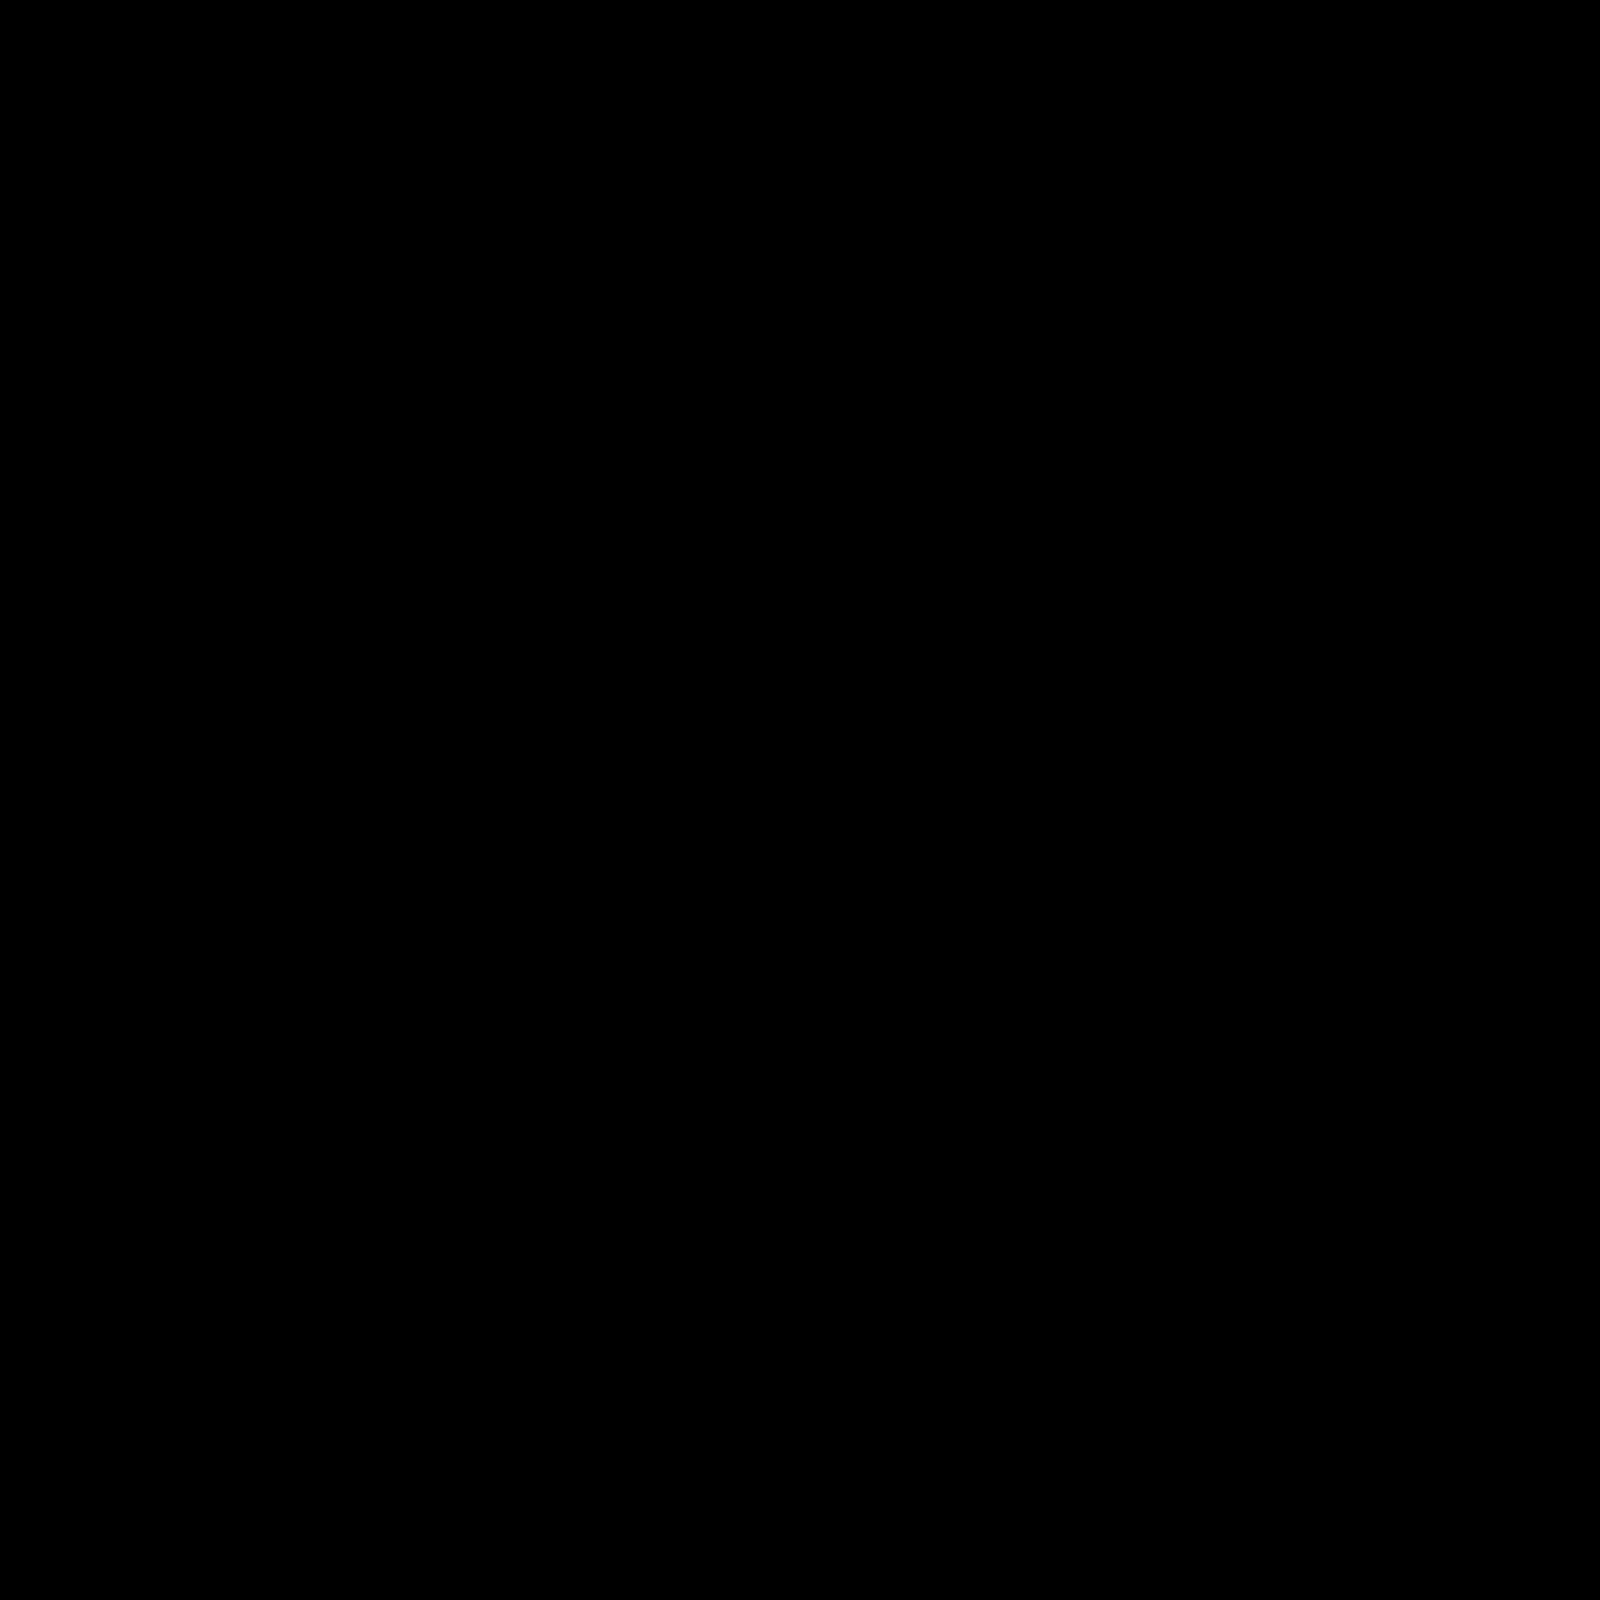 Goniec icon